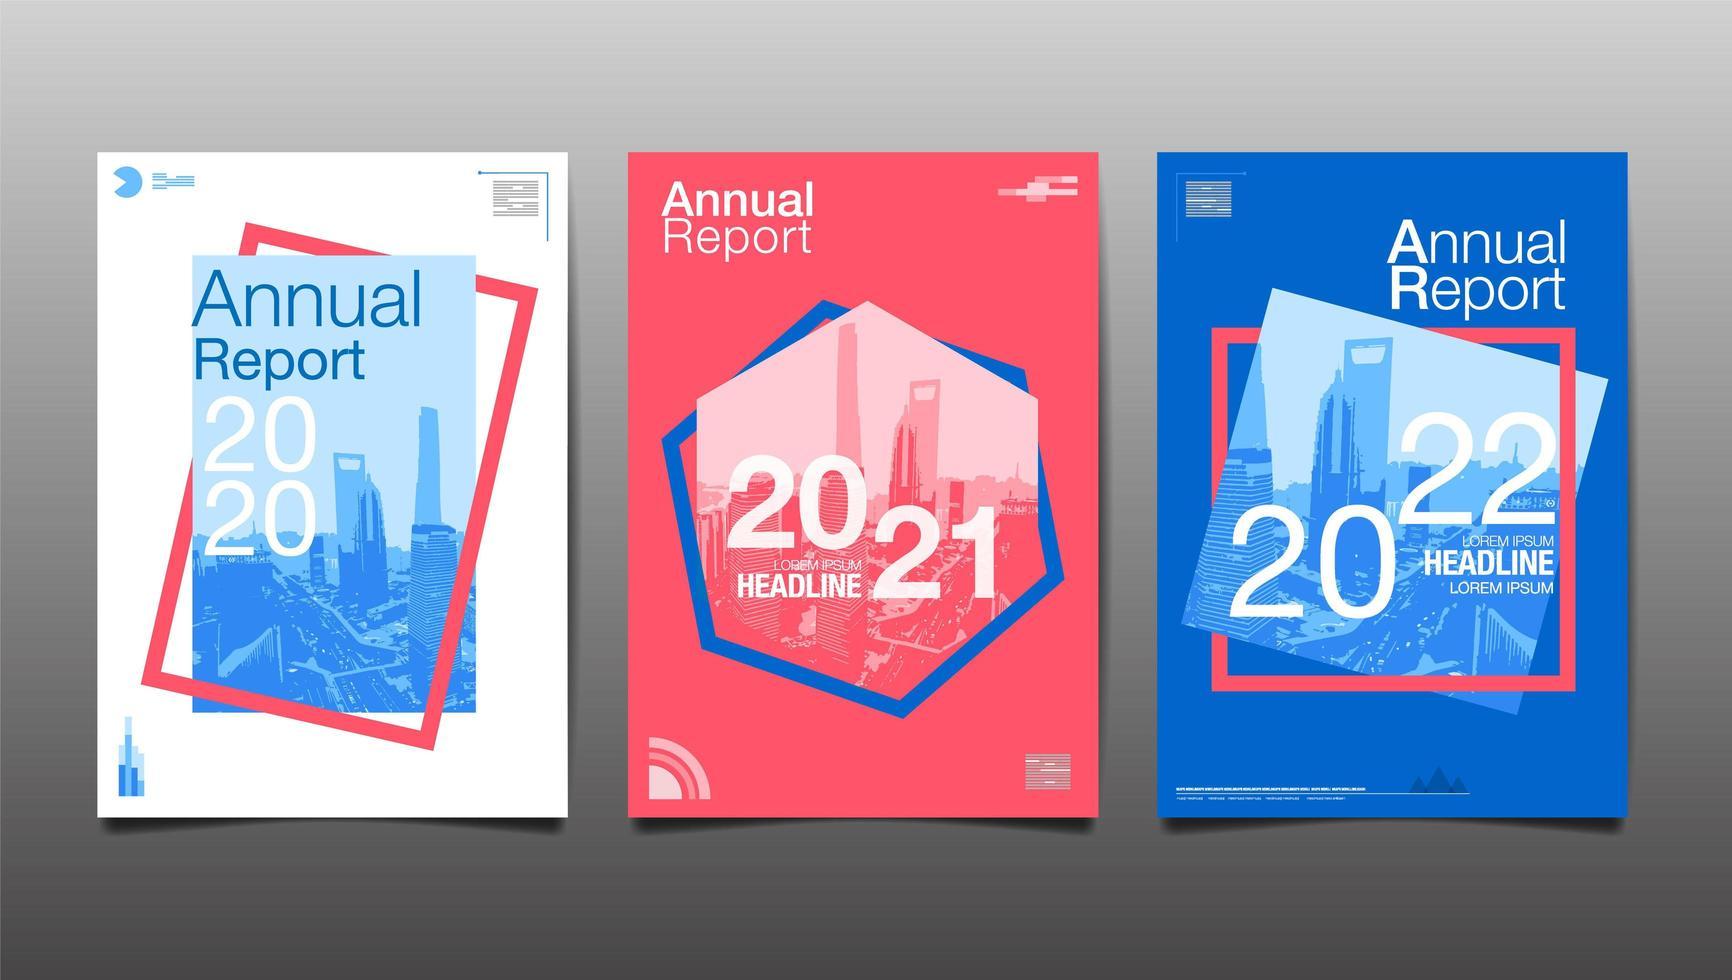 Informe geométrico colorido 2020, 2021, 2022 informes anuales vector